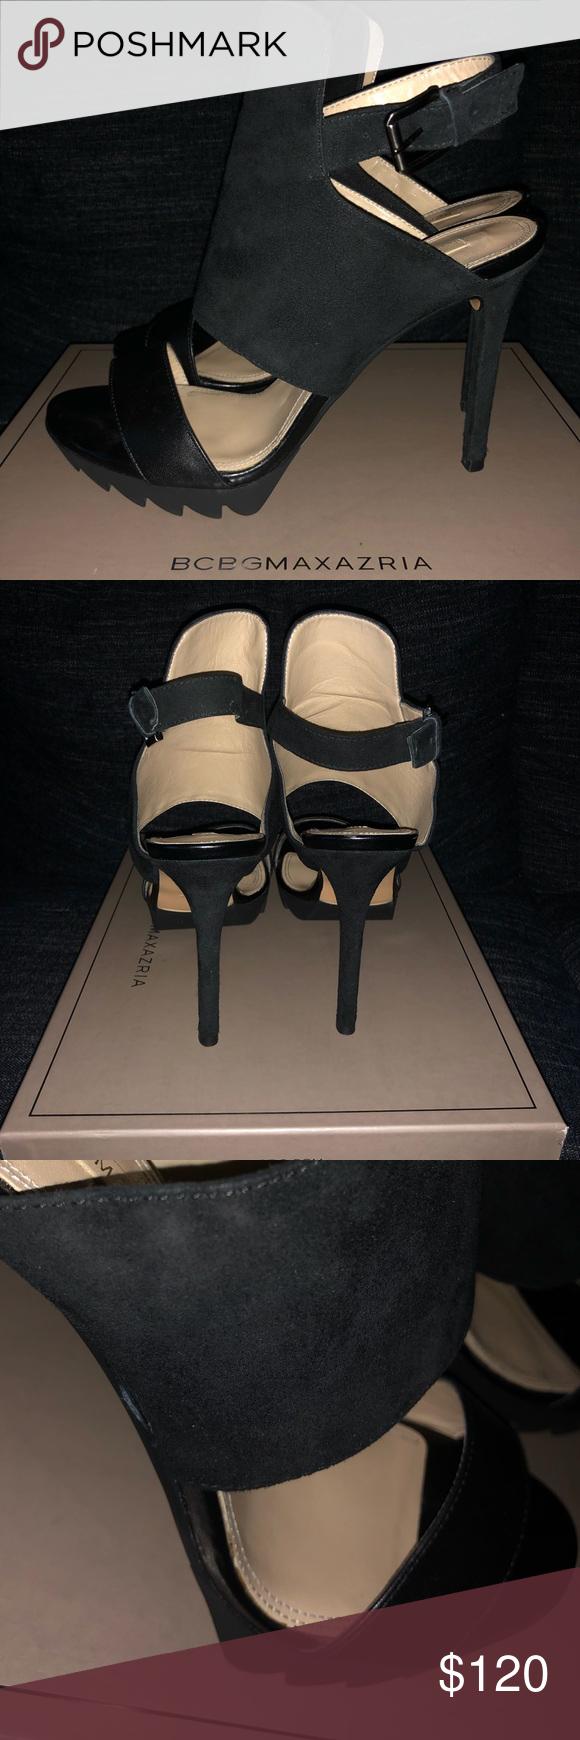 Bcbg High Heel Leather Sandal Heels Leather Sandals Leather Heels